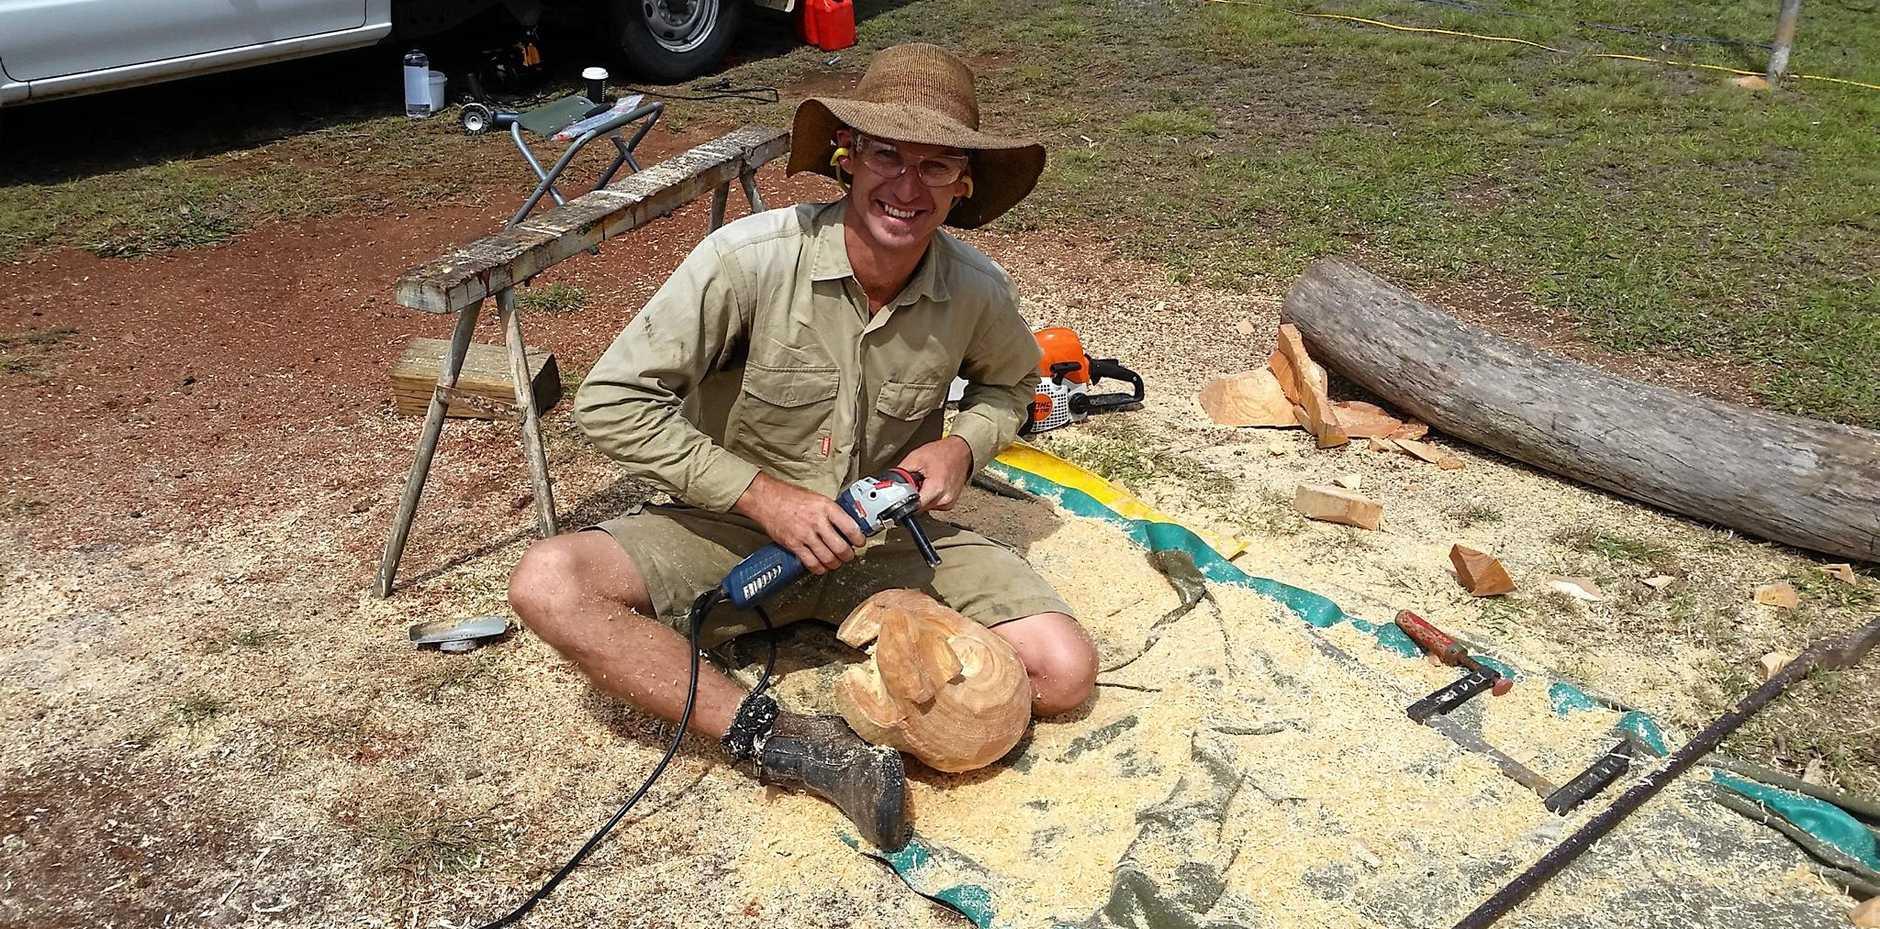 UNIQUE TALENT: Shane Christensen creating sculptures at the Blackbutt Avocado Festival 2016